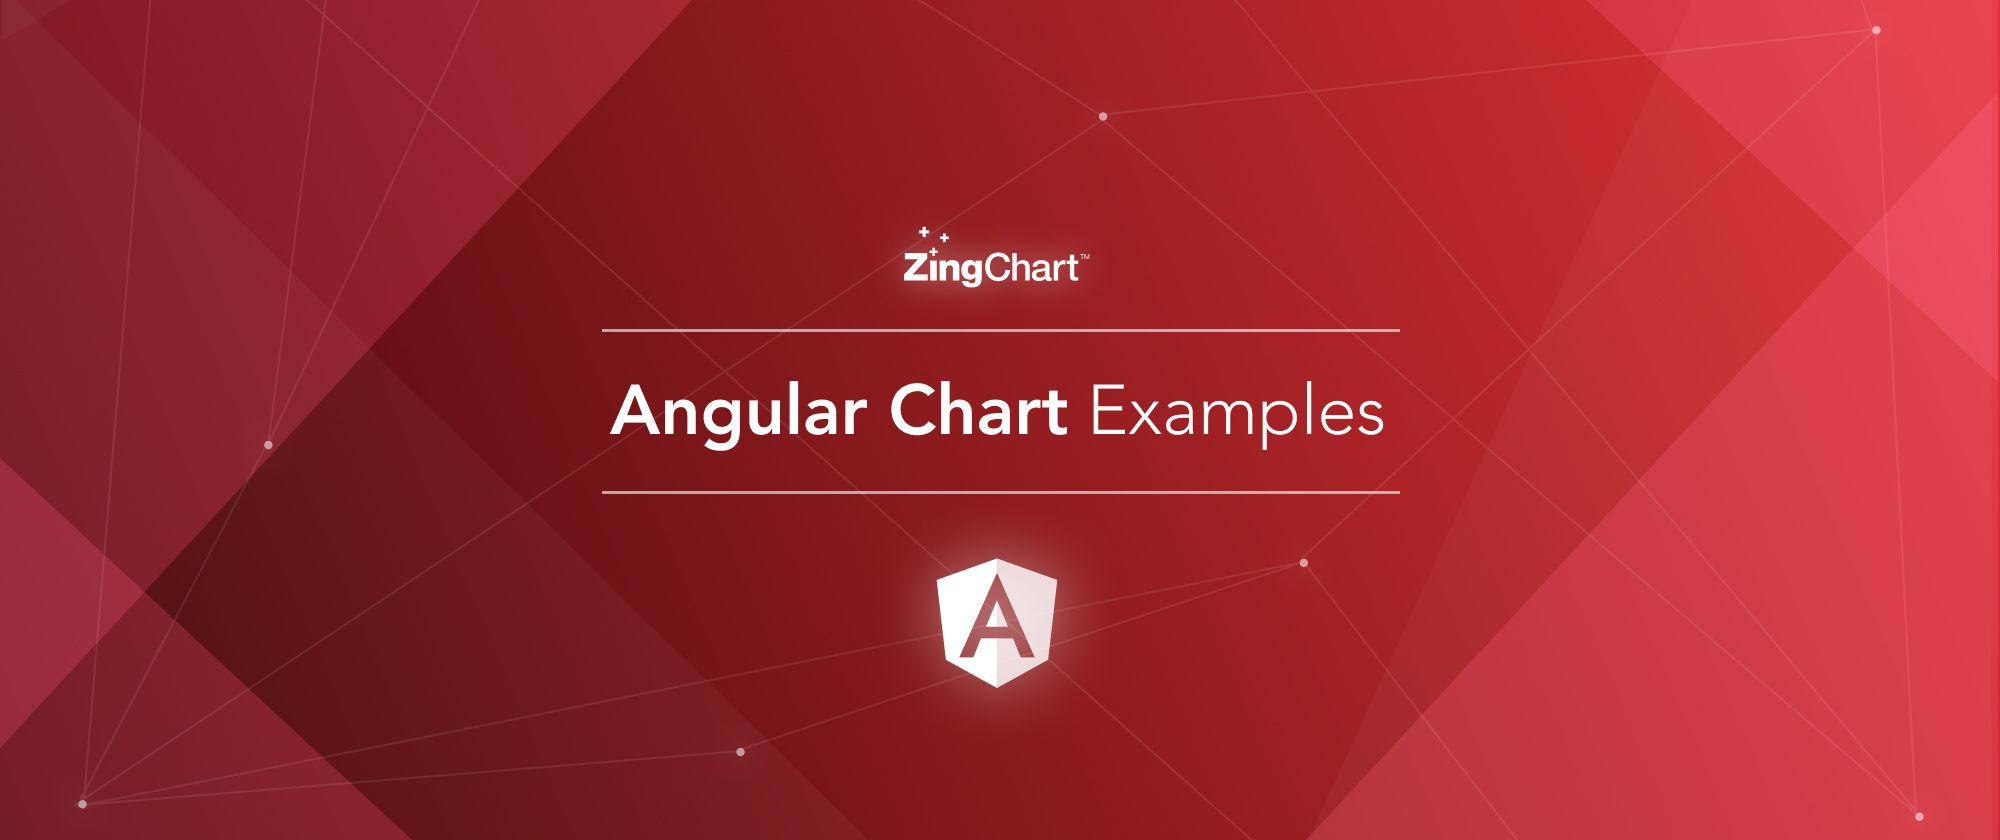 Angular Chart Examples with ZingChart